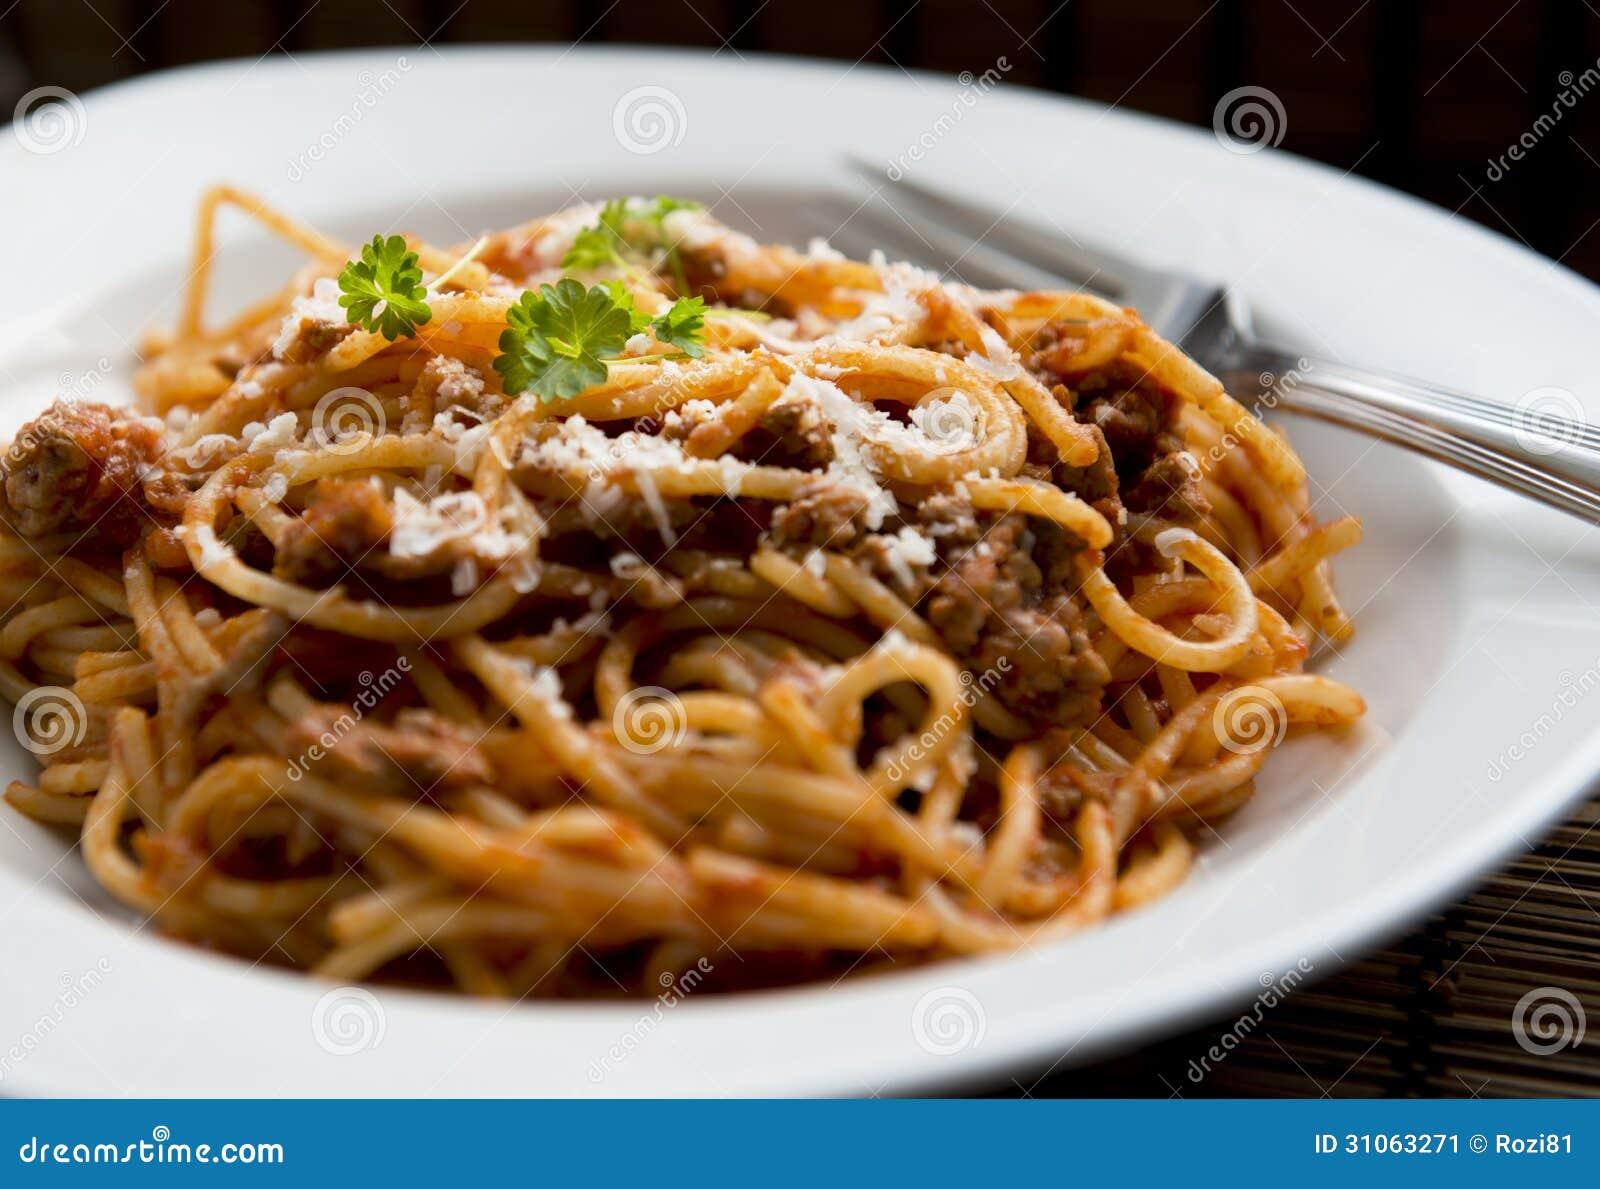 Pasta Dish Stock Image - Image: 31063271